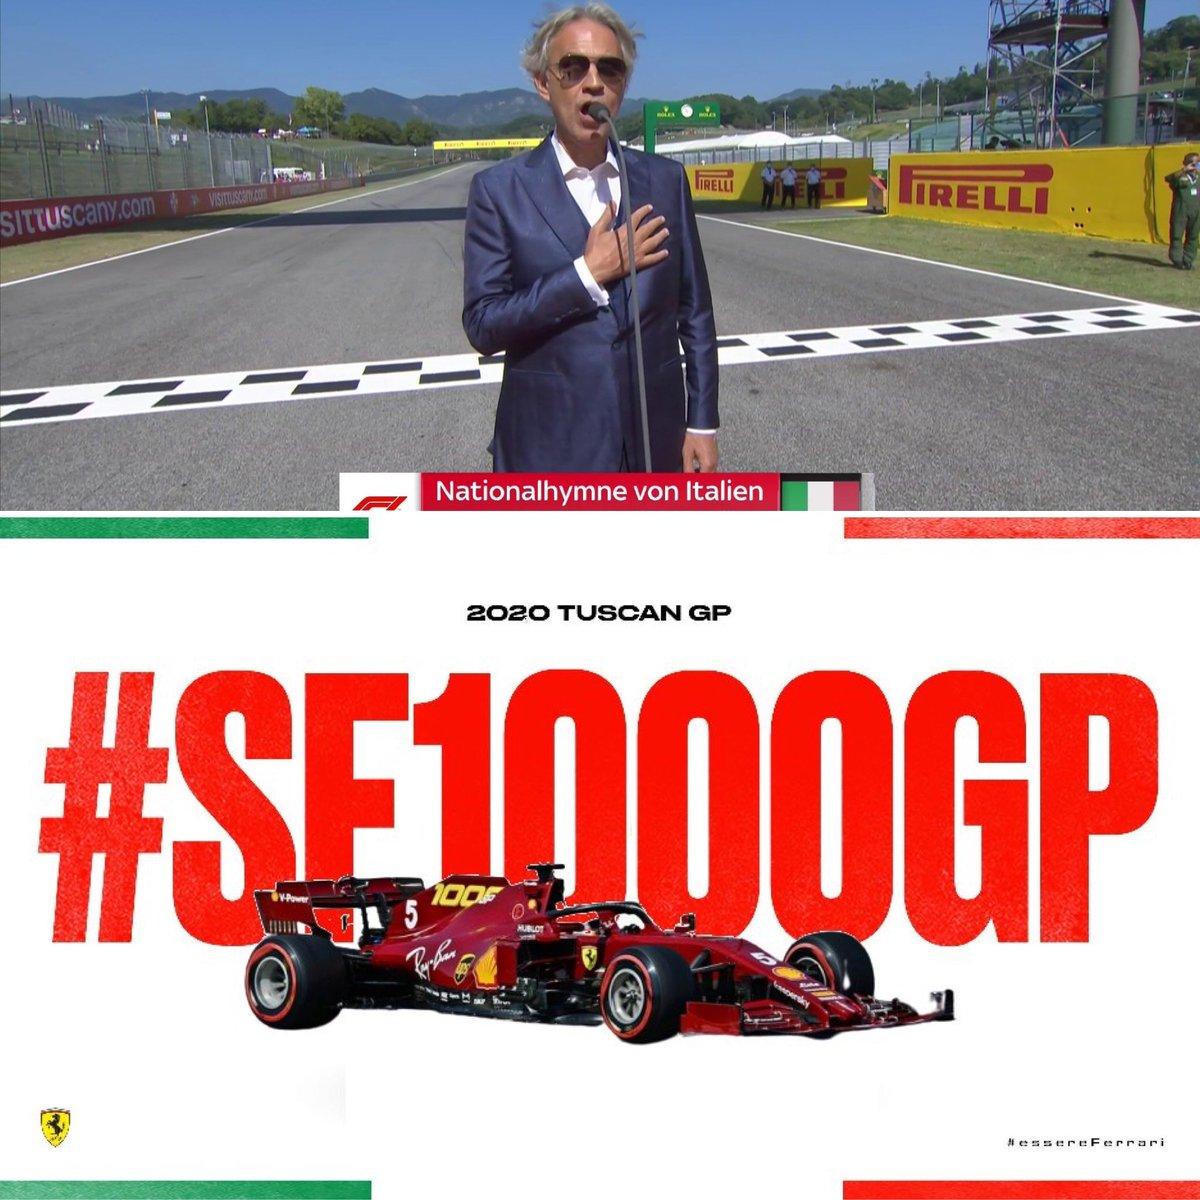 Italian Tuscan Mugello GP 2020 Pictures Part 21 #Tifosi #TuscanGP #AndreaBocelli #essereFerrari #Ferrari #SF1000 #Charles16 #Seb5 #CL16  #Tifosiclub #F1 #liveyourferraripassion #Vettel #Maranello #forzaferrari  #Skysports https://t.co/xC68ioEZvU